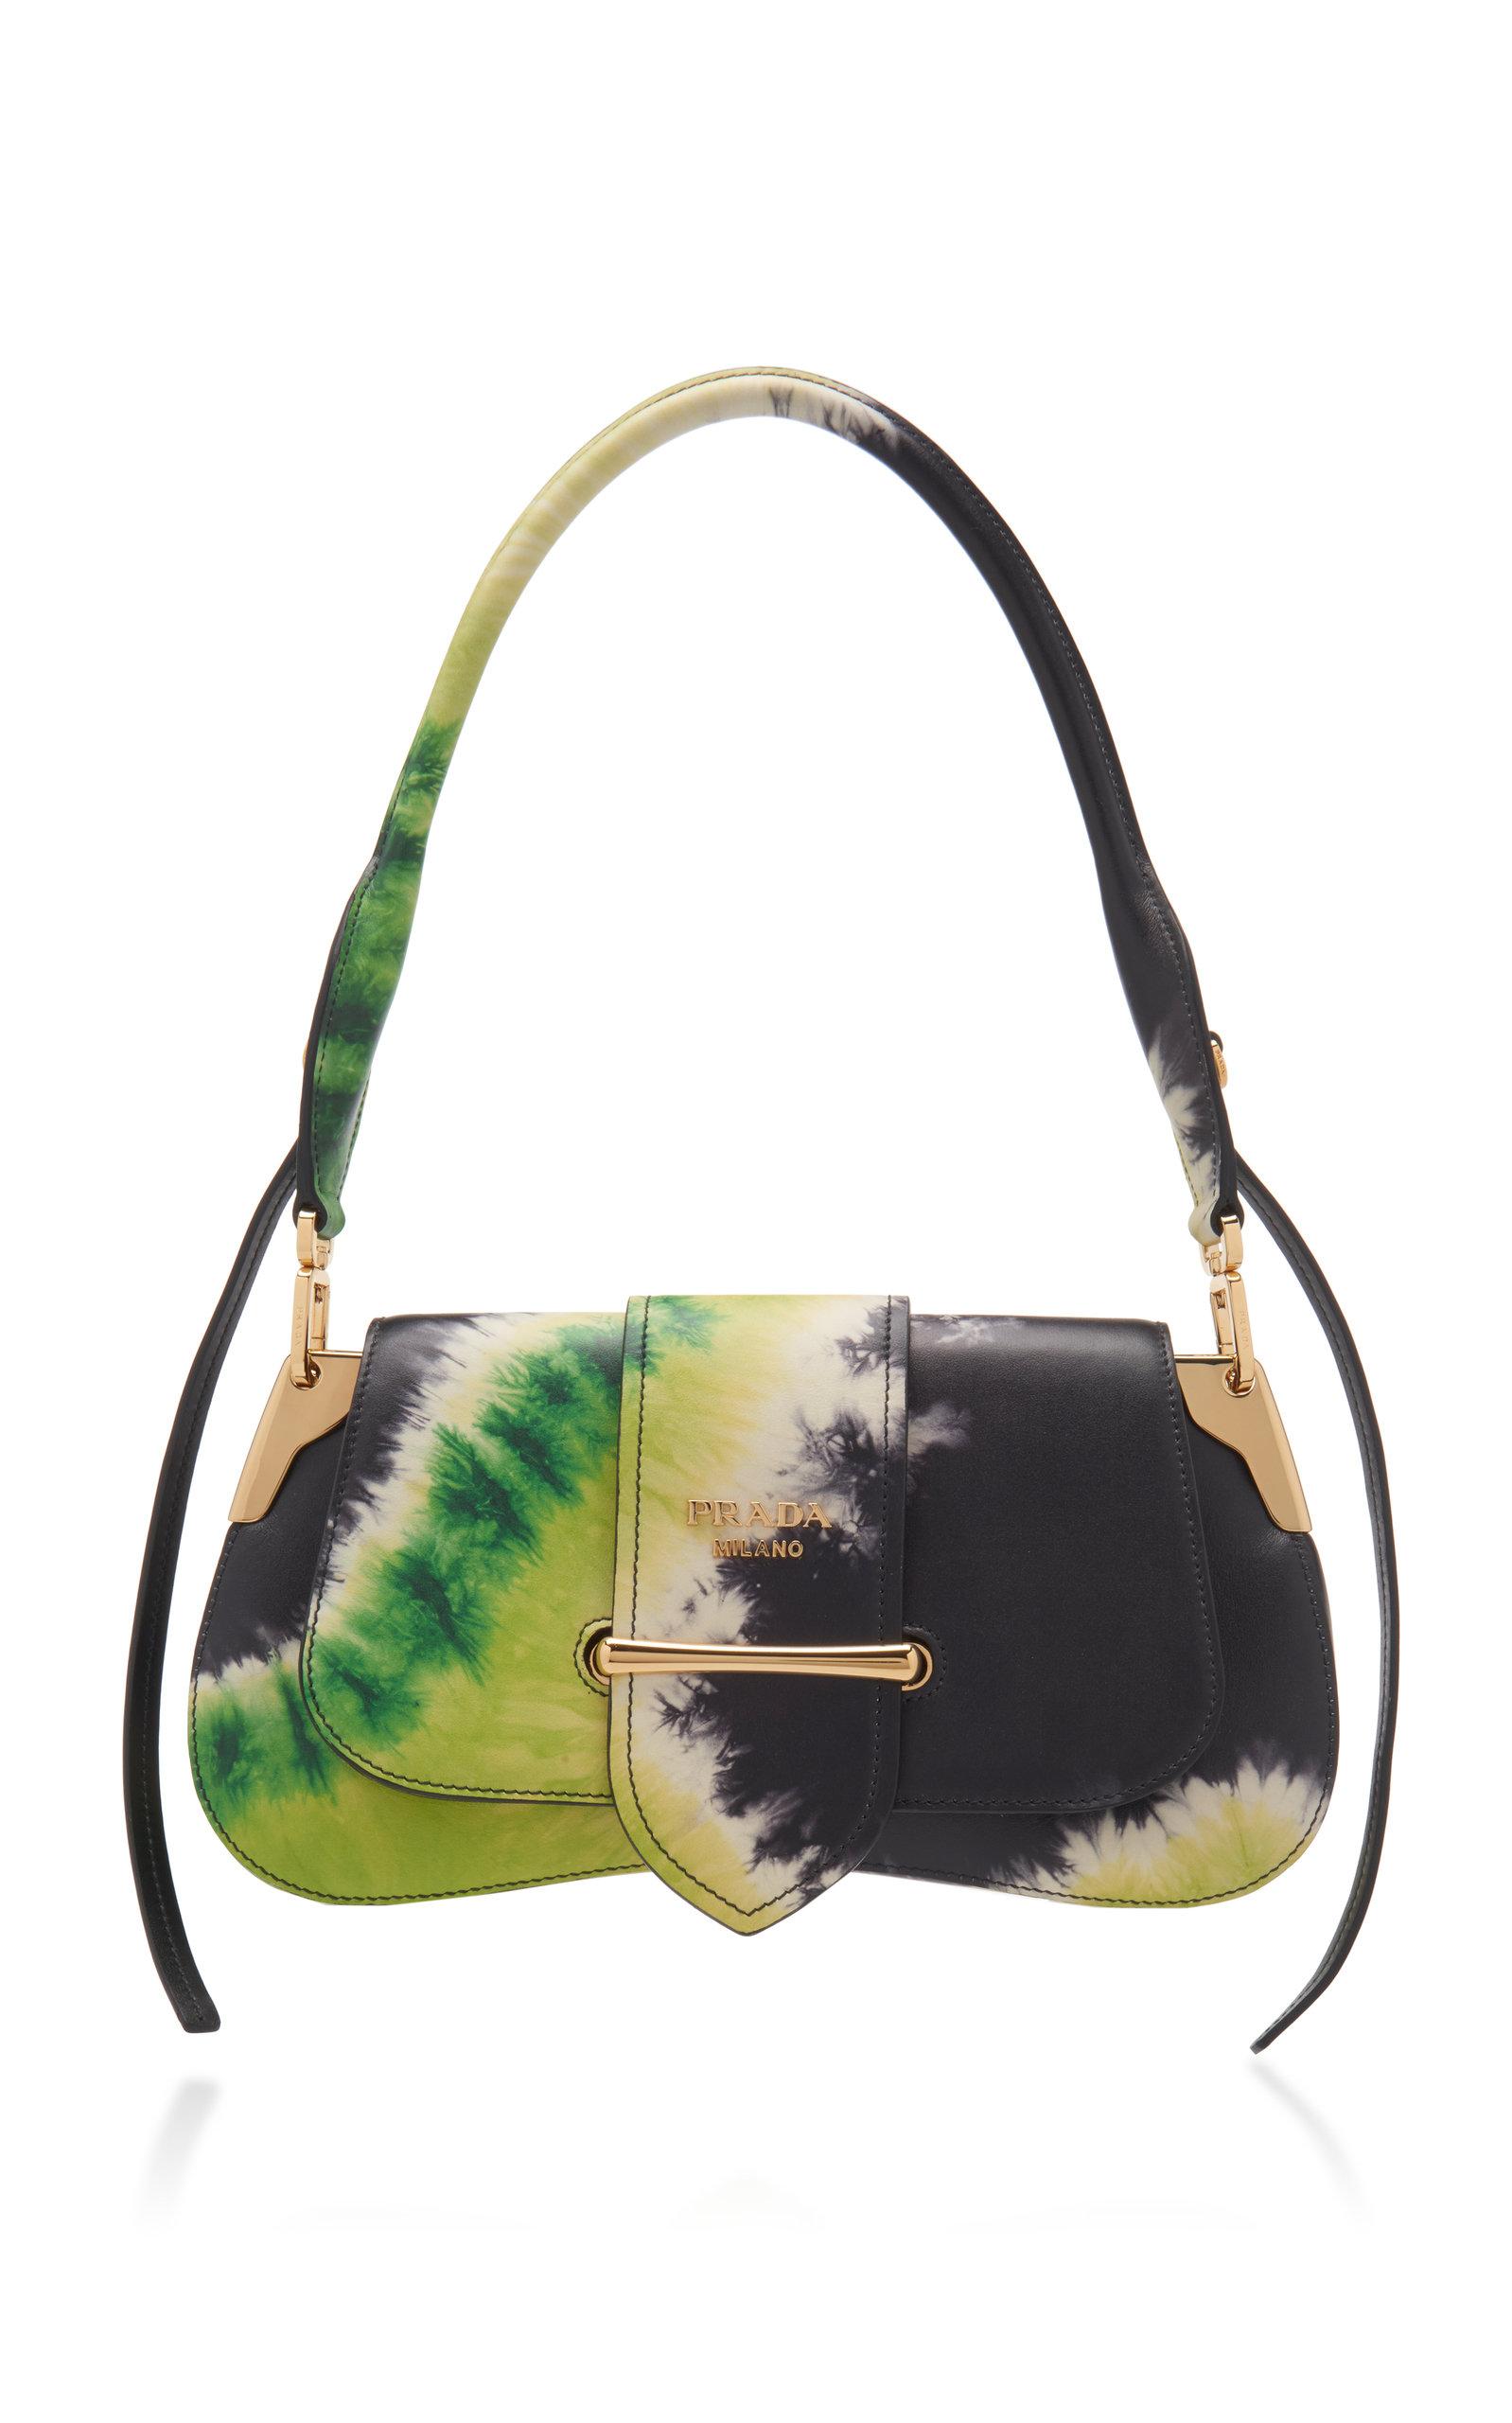 bc7f2c59543c1 PradaPattina Tie-Dye Leather Shoulder Bag. CLOSE. Loading